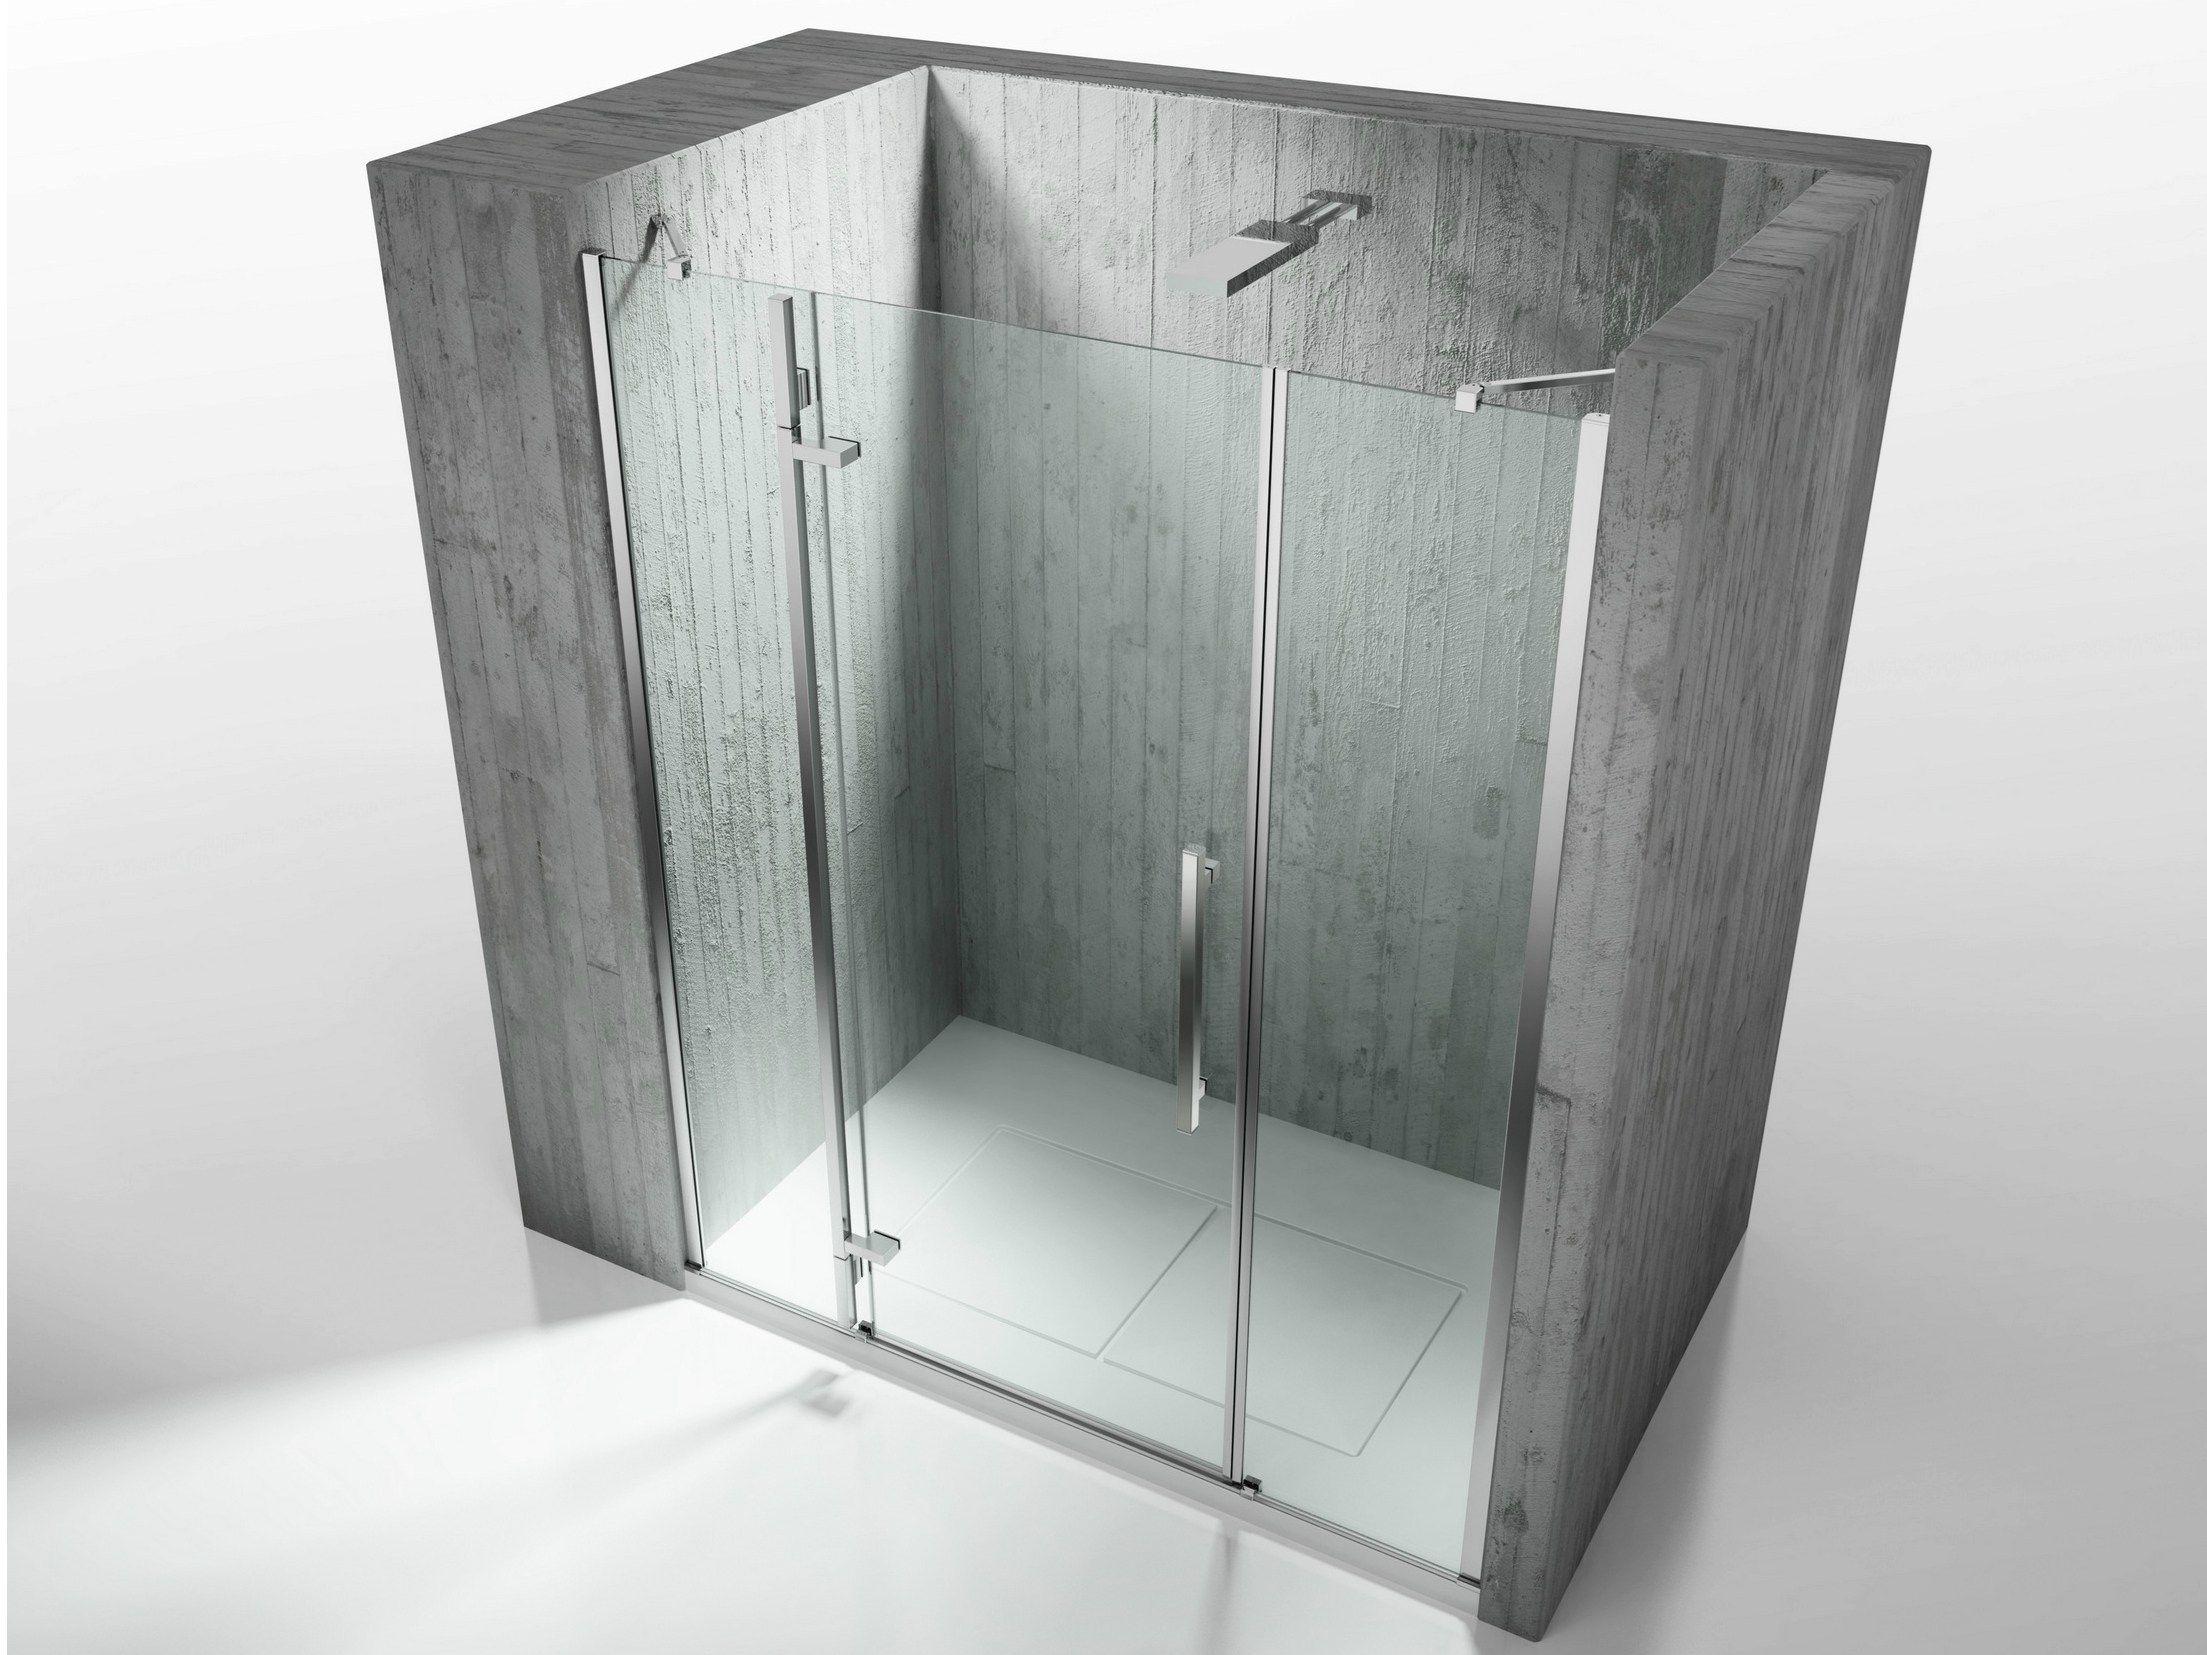 Nicchia doccia su misura ~ avienix.com for .